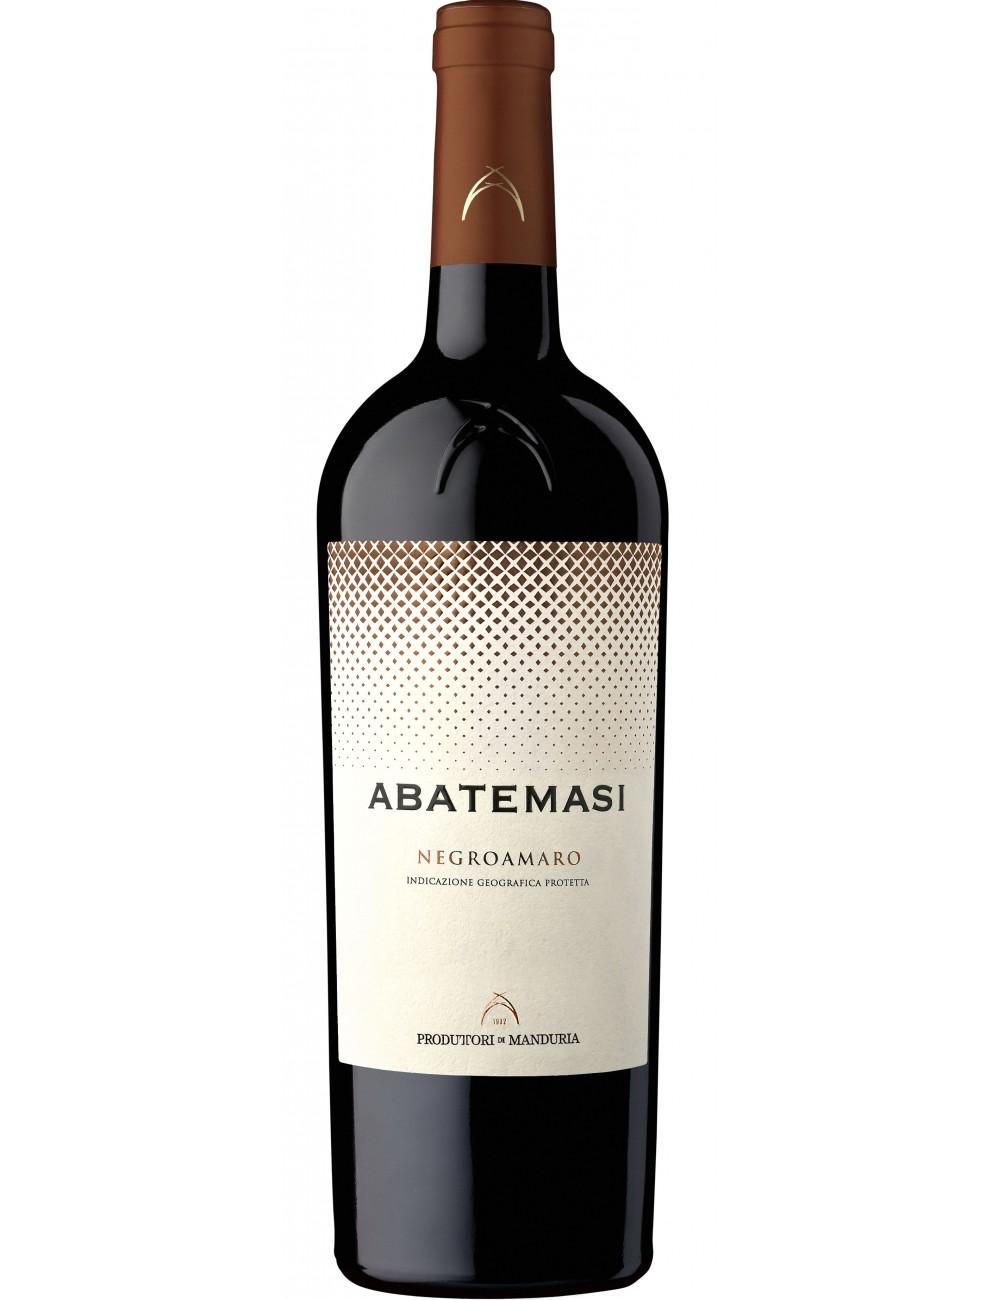 ABATEMASI 2017 - 750 ML